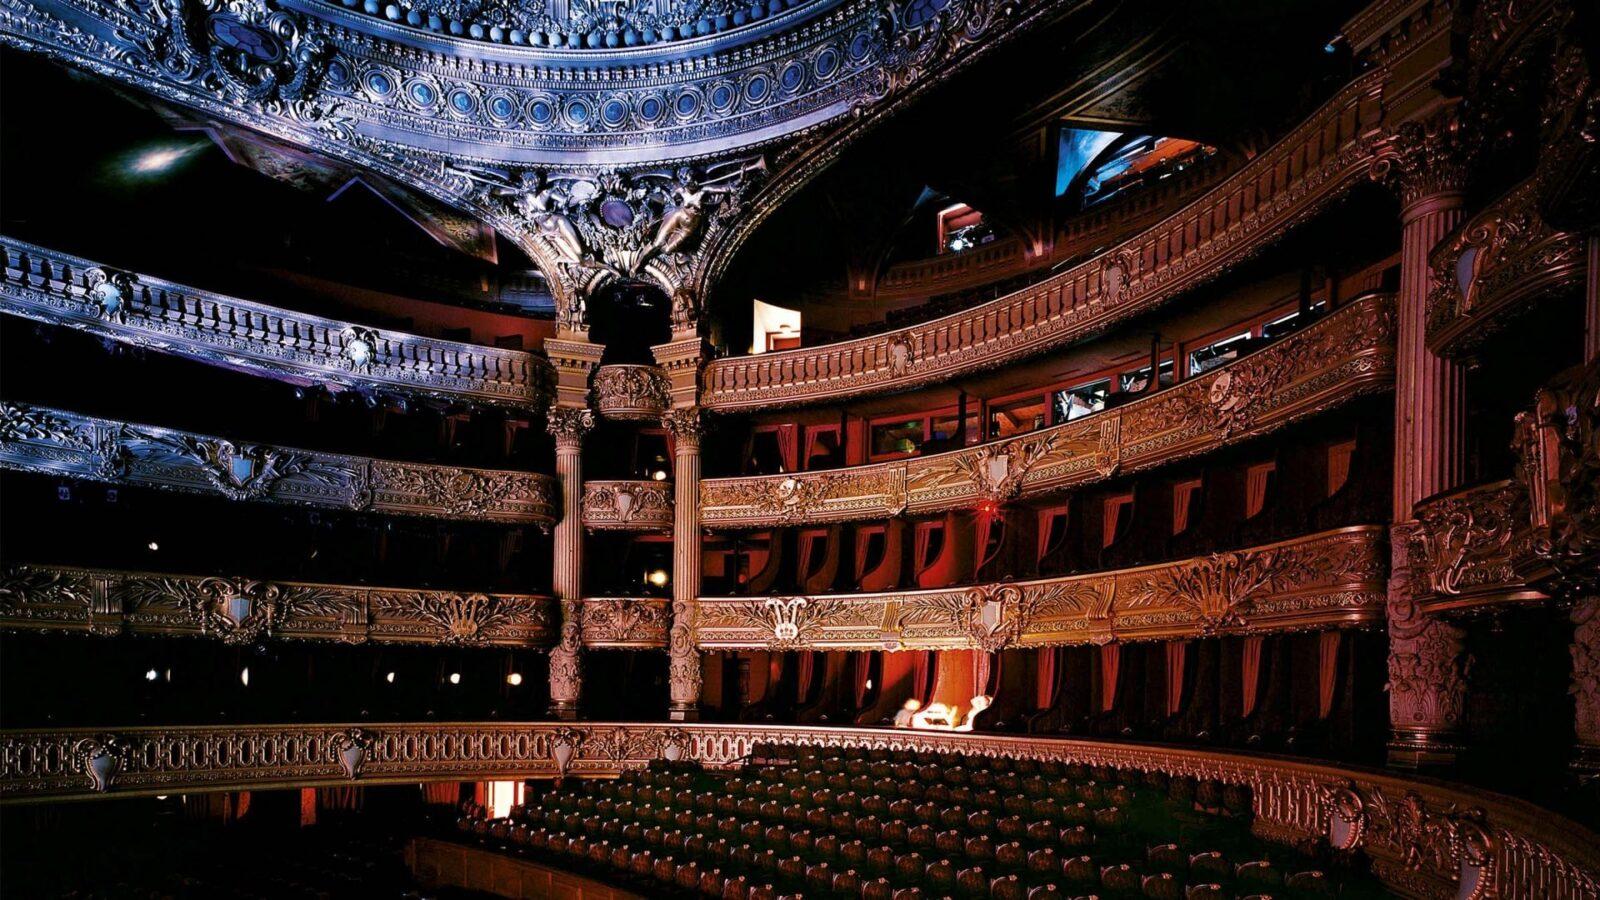 Paris - Le Meurice - La Traviata Experience